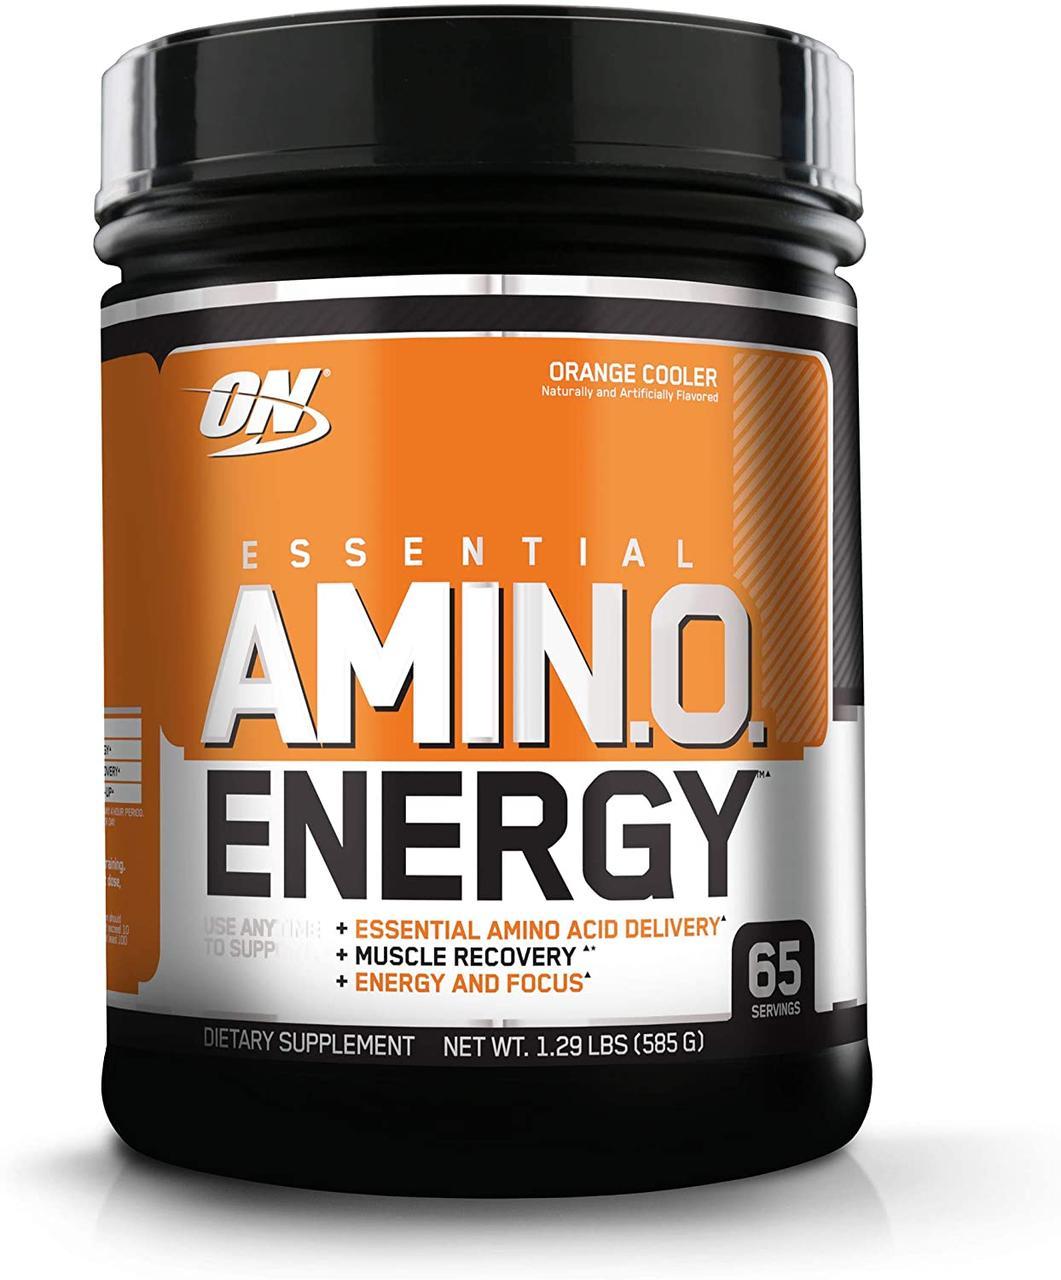 Комплекс аминокислот Optimum Nutrition Amino Energy (585 г) оптимум амино энерджи orange cooler